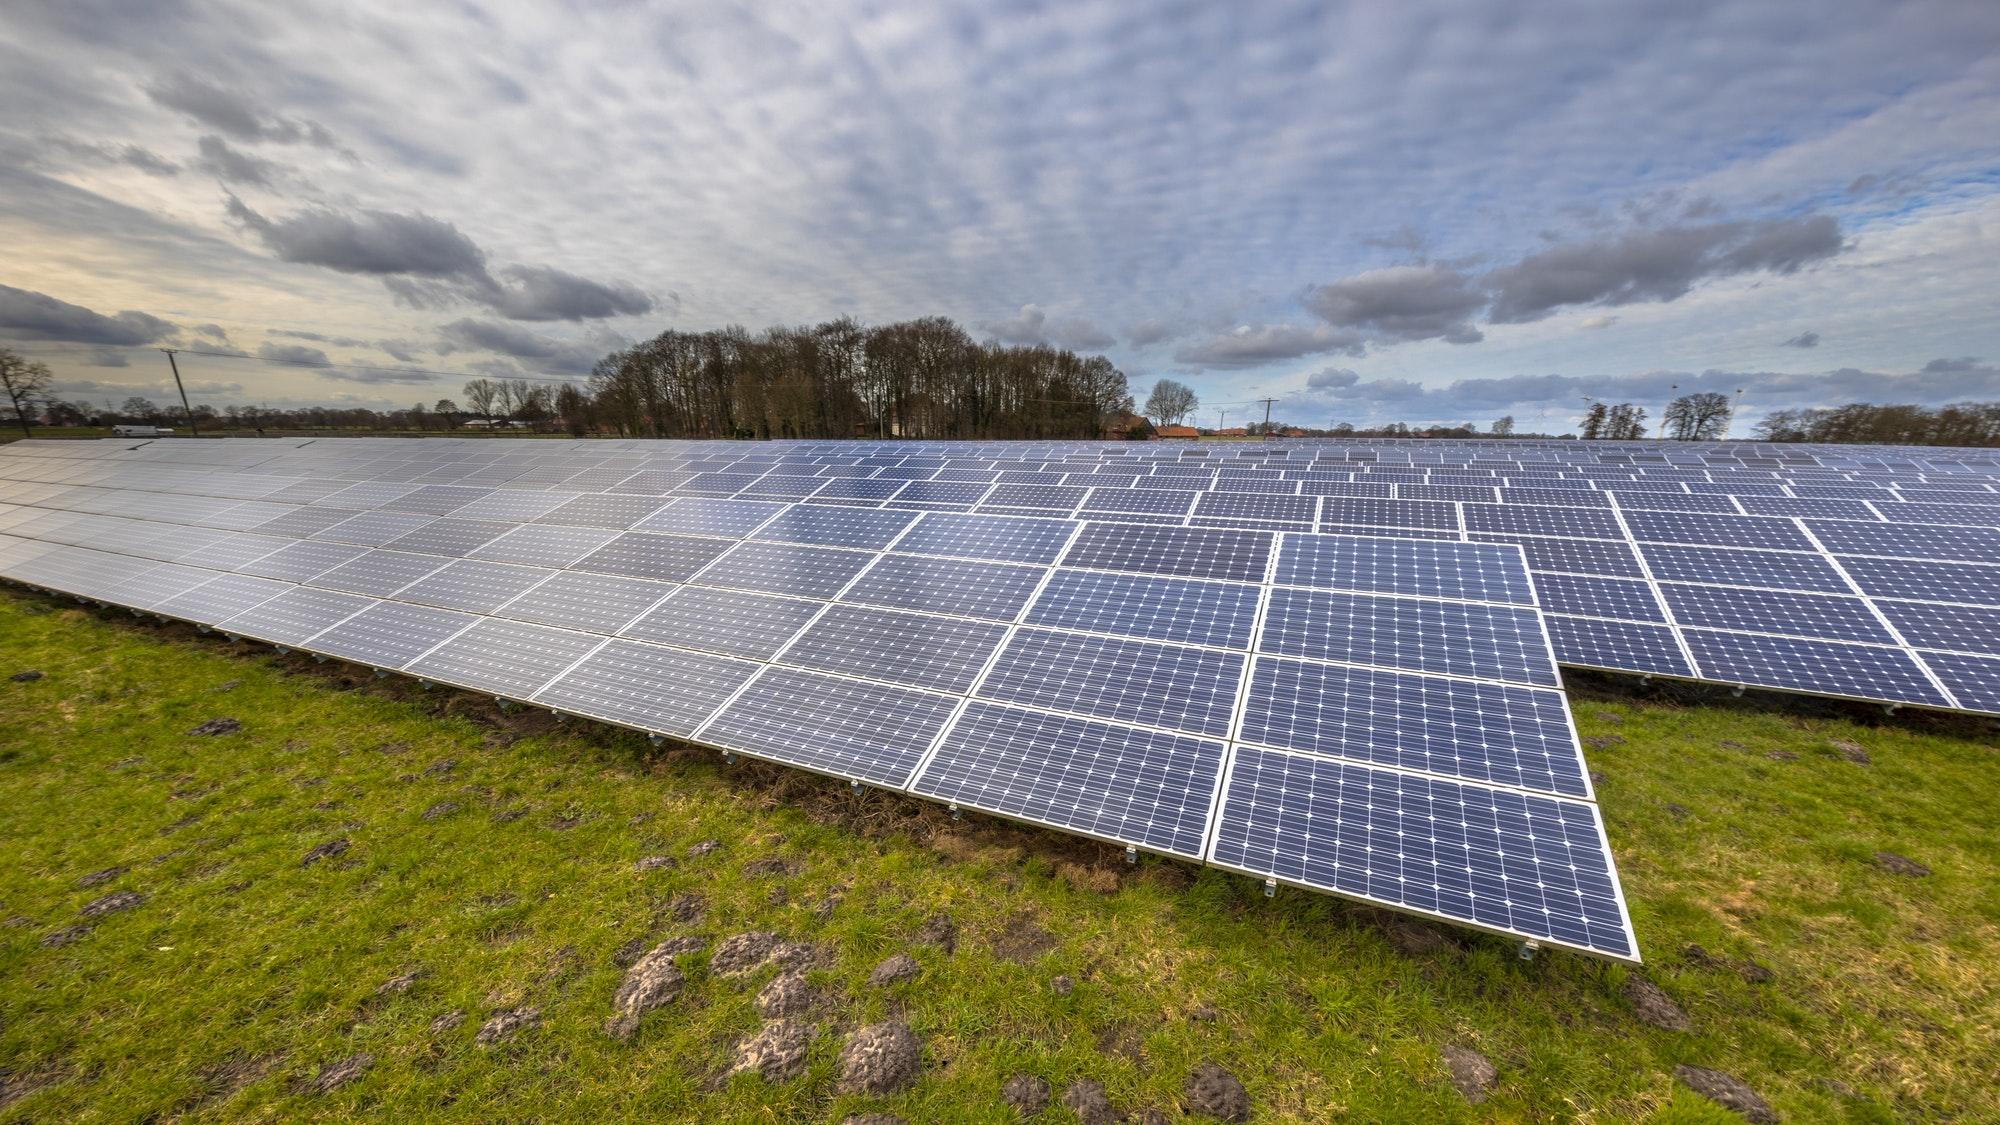 solar energy panels clean energy background